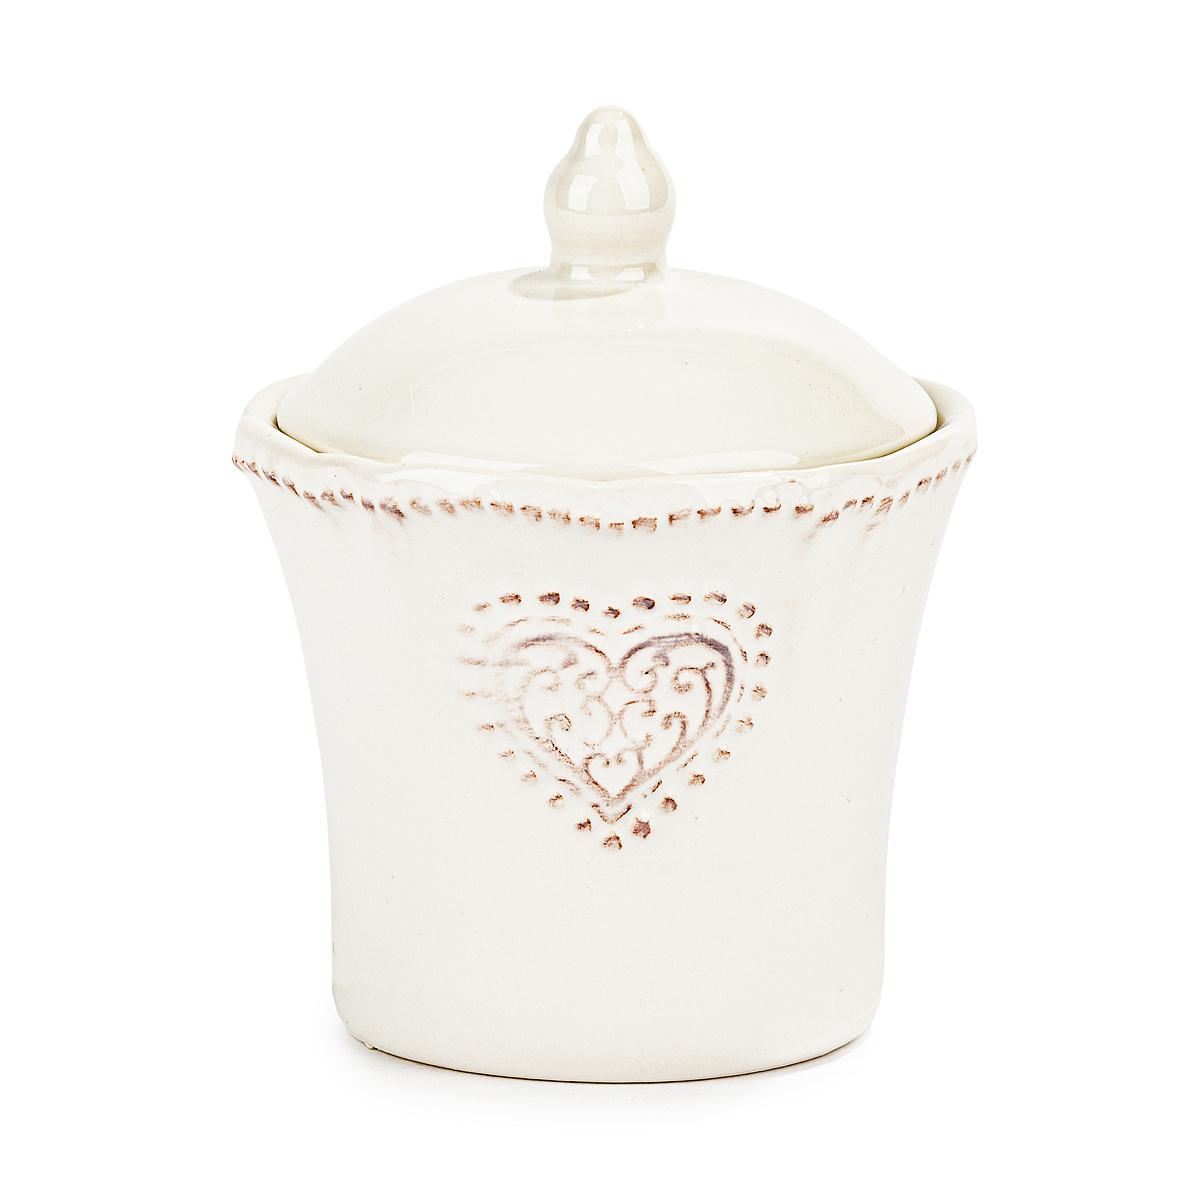 Keramická cukřenka Srdce 9 x 11,5 cm